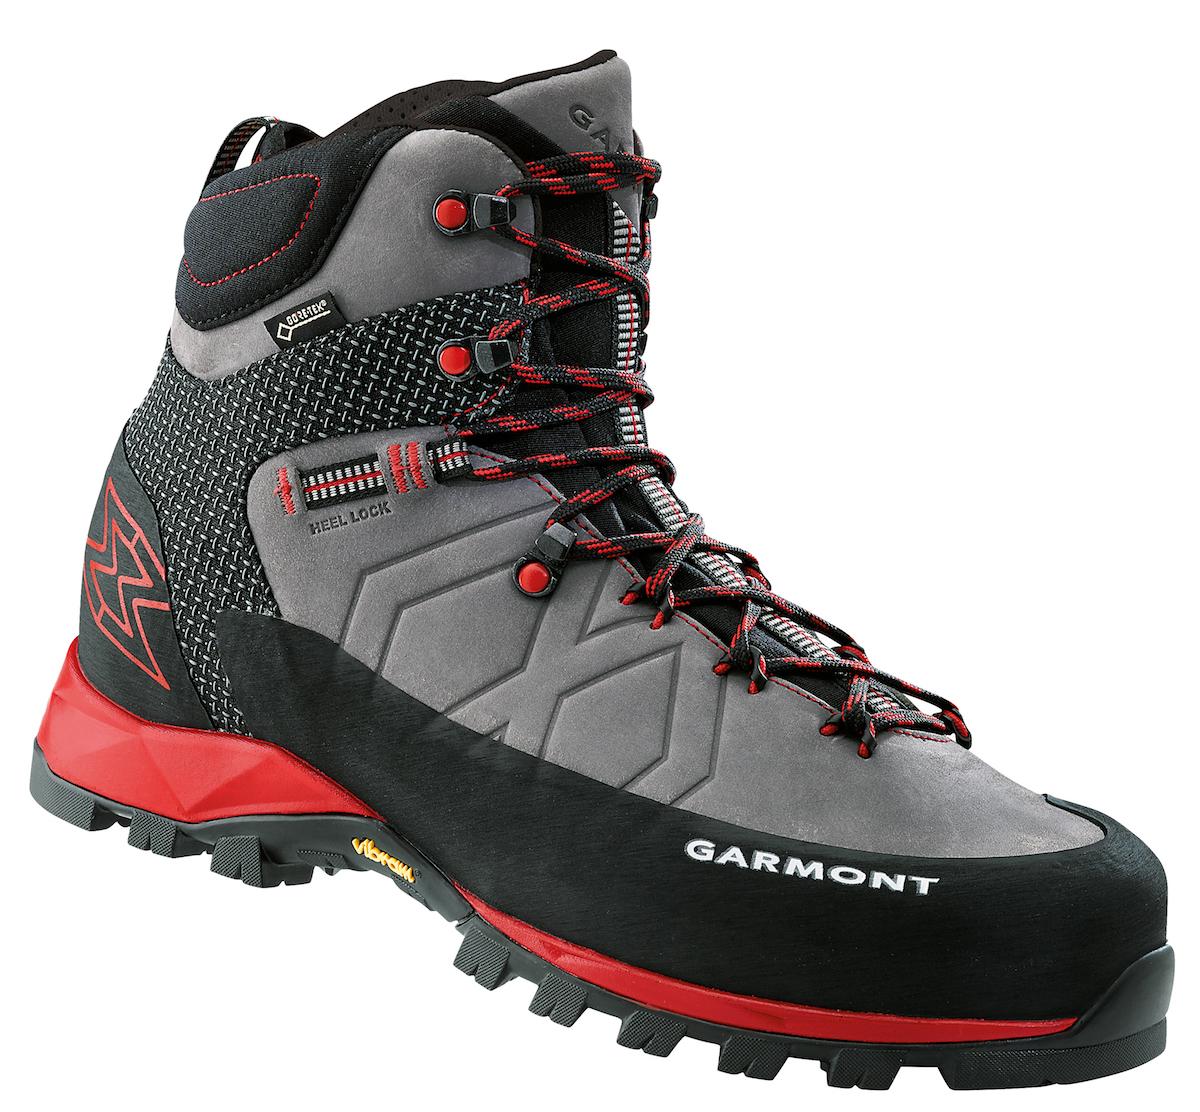 Garmont Toubkal GTX - Walking boots - Men's